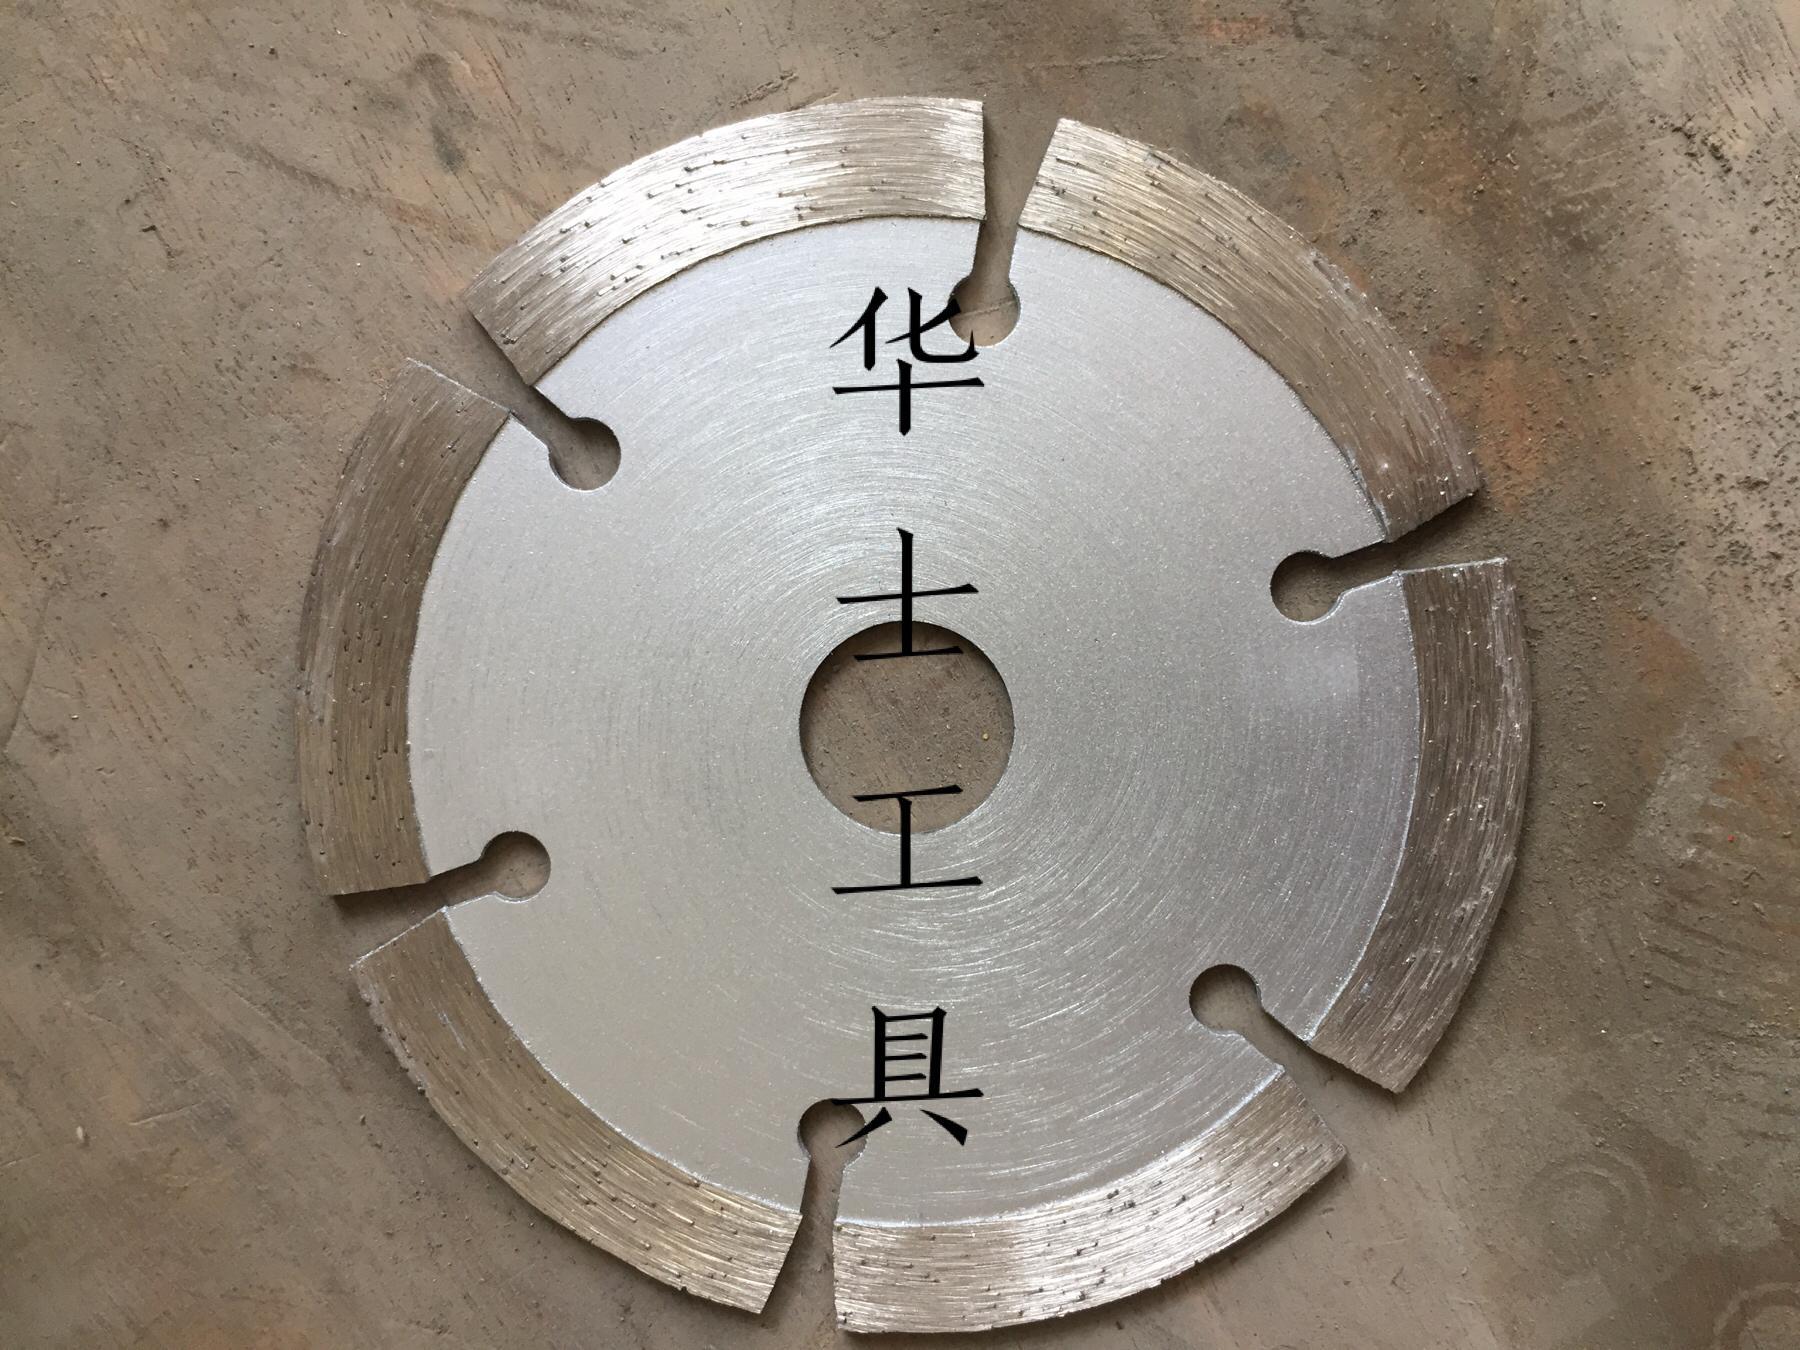 Stone-Segmented saw blade